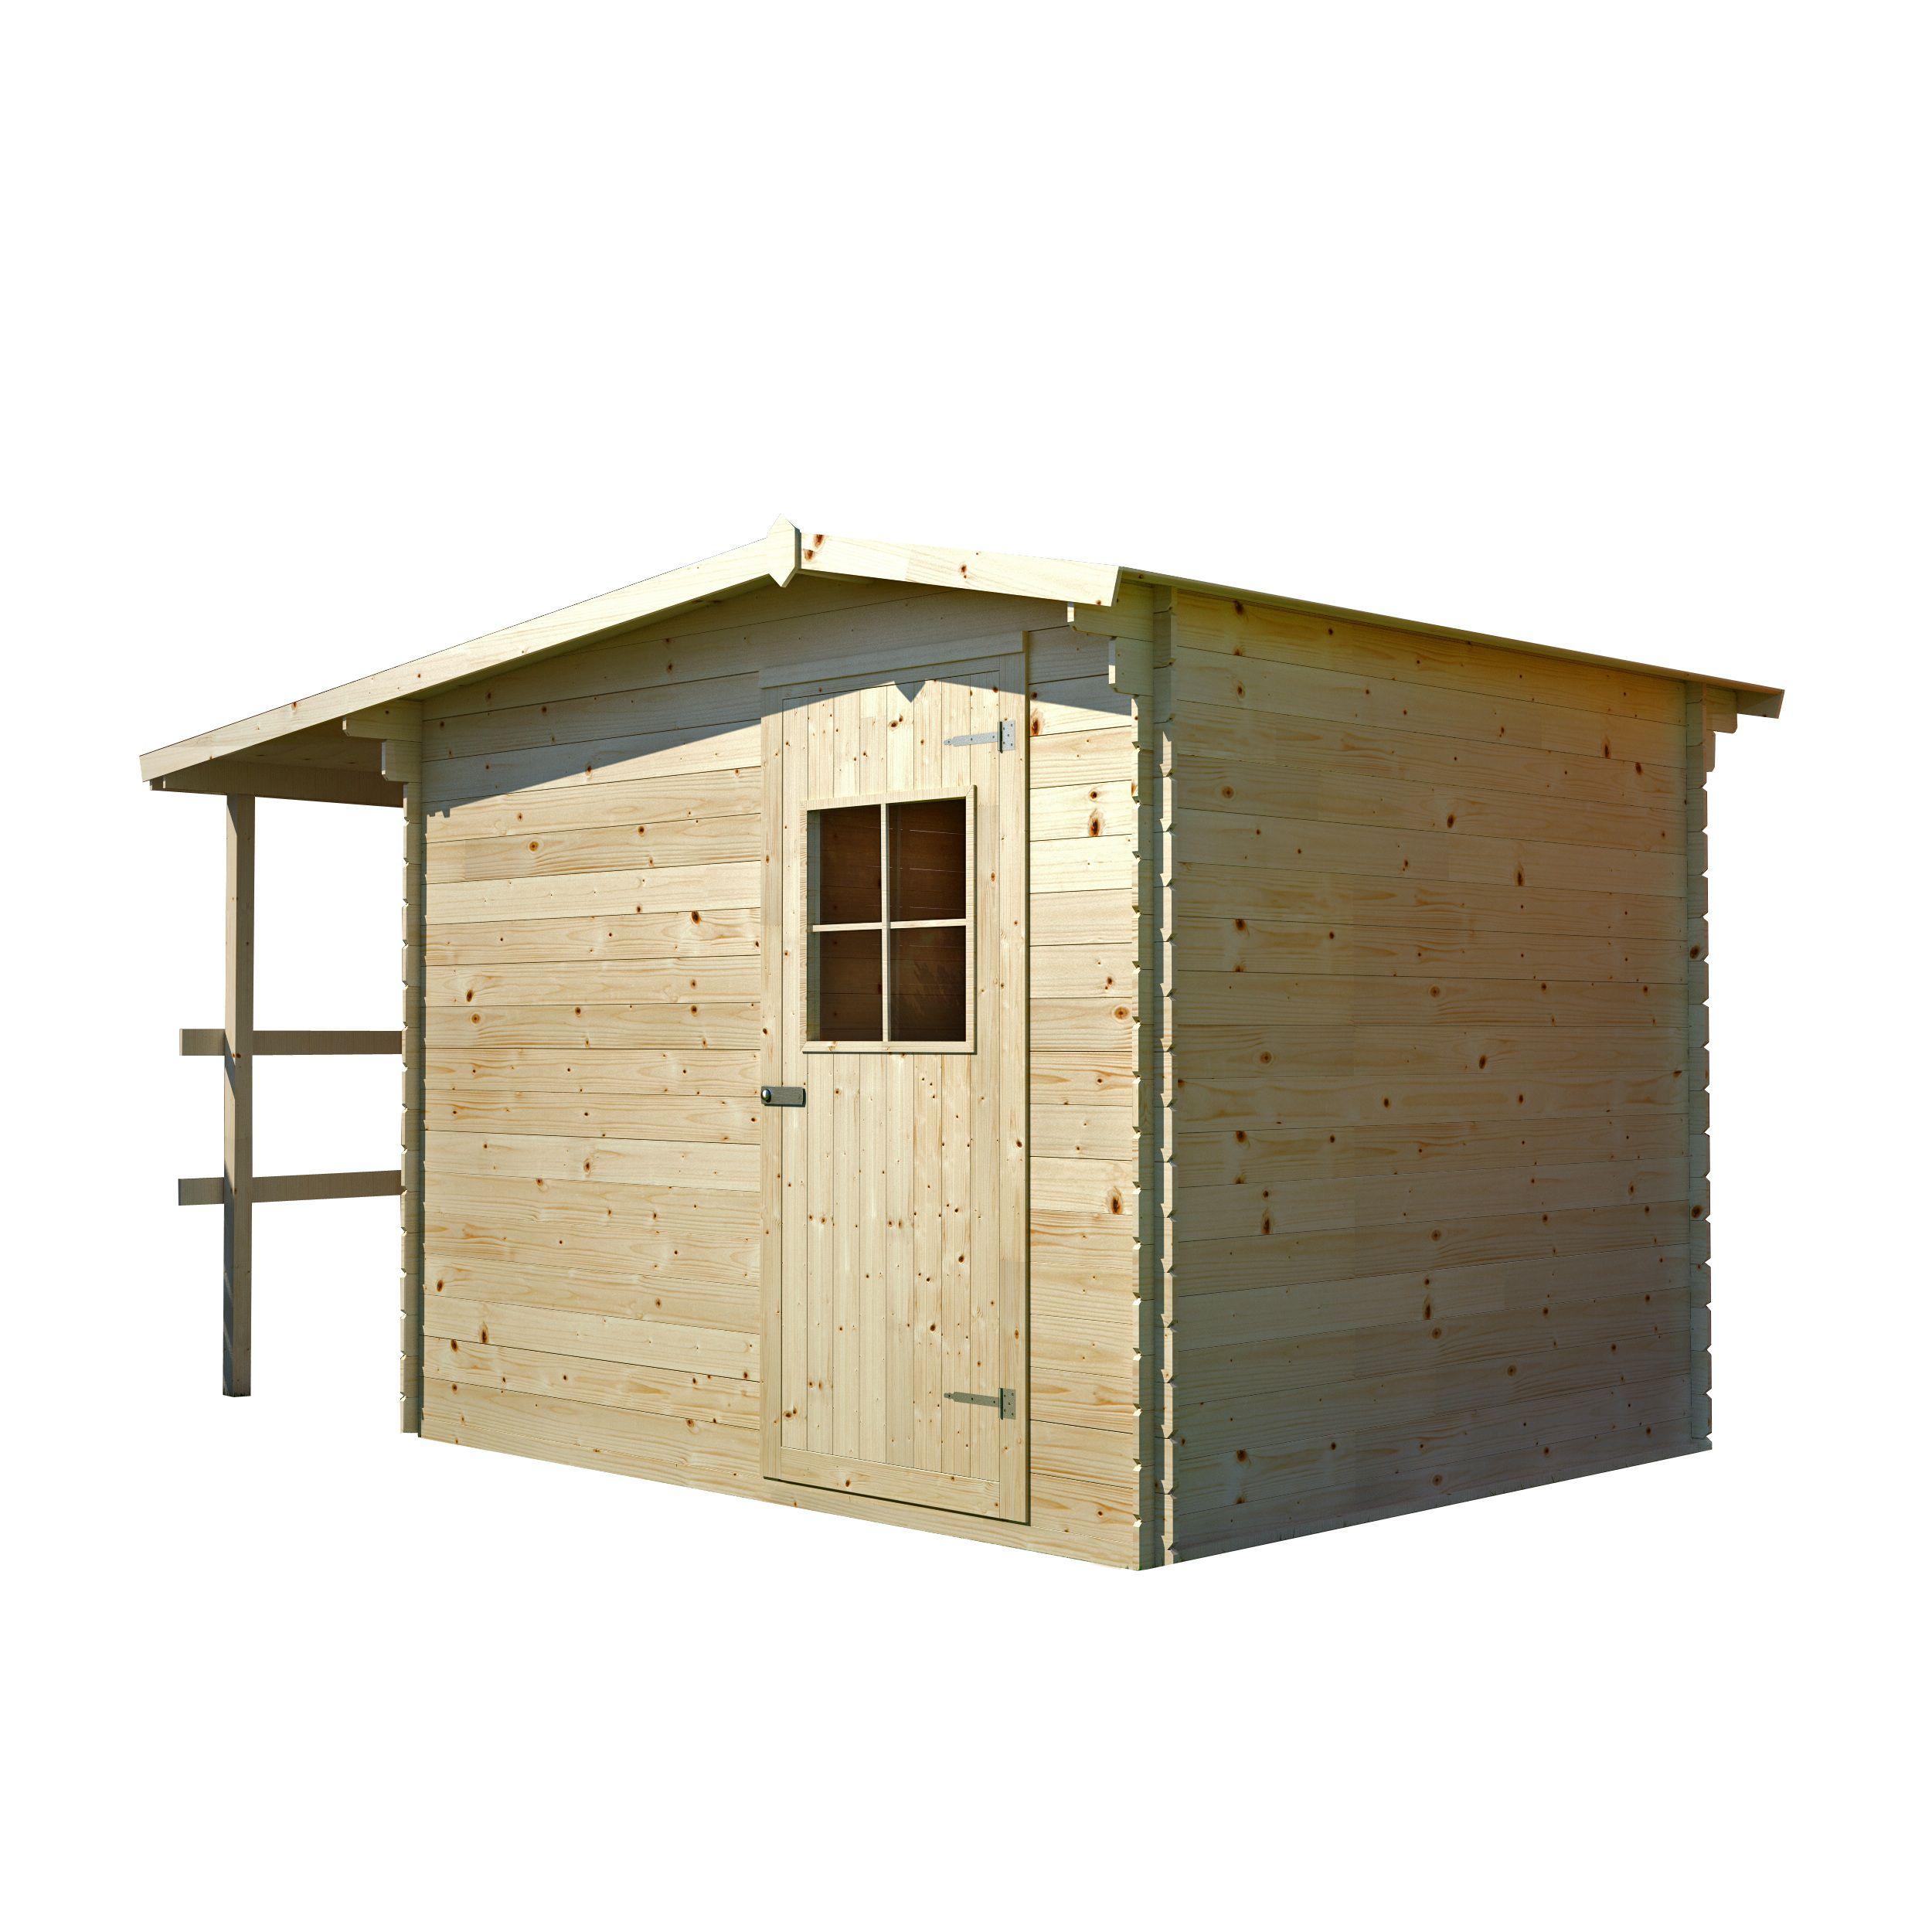 Gartenhaus Melk - 3,30 x 2,33 Meter aus 19 mm Blockbohlen